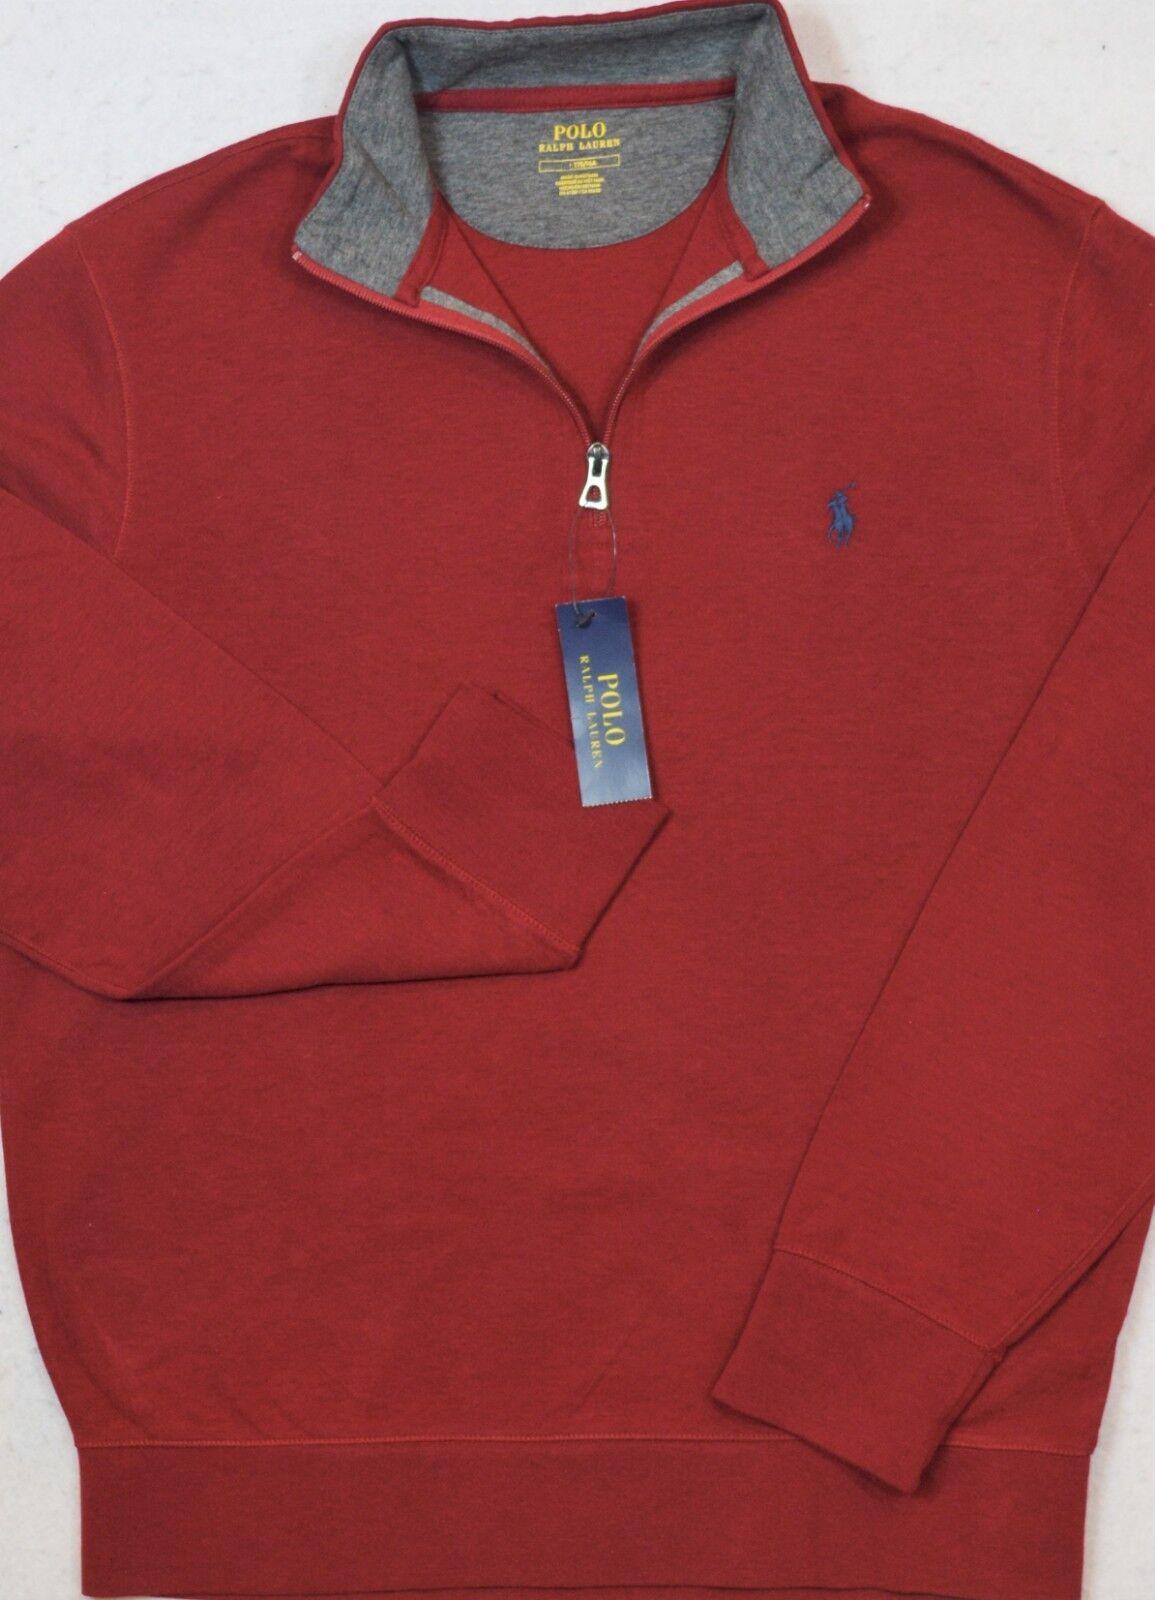 Polo Ralph Lauren Jersey Pullover ROT 1/2 Half-Zip Größe M Medium NWT